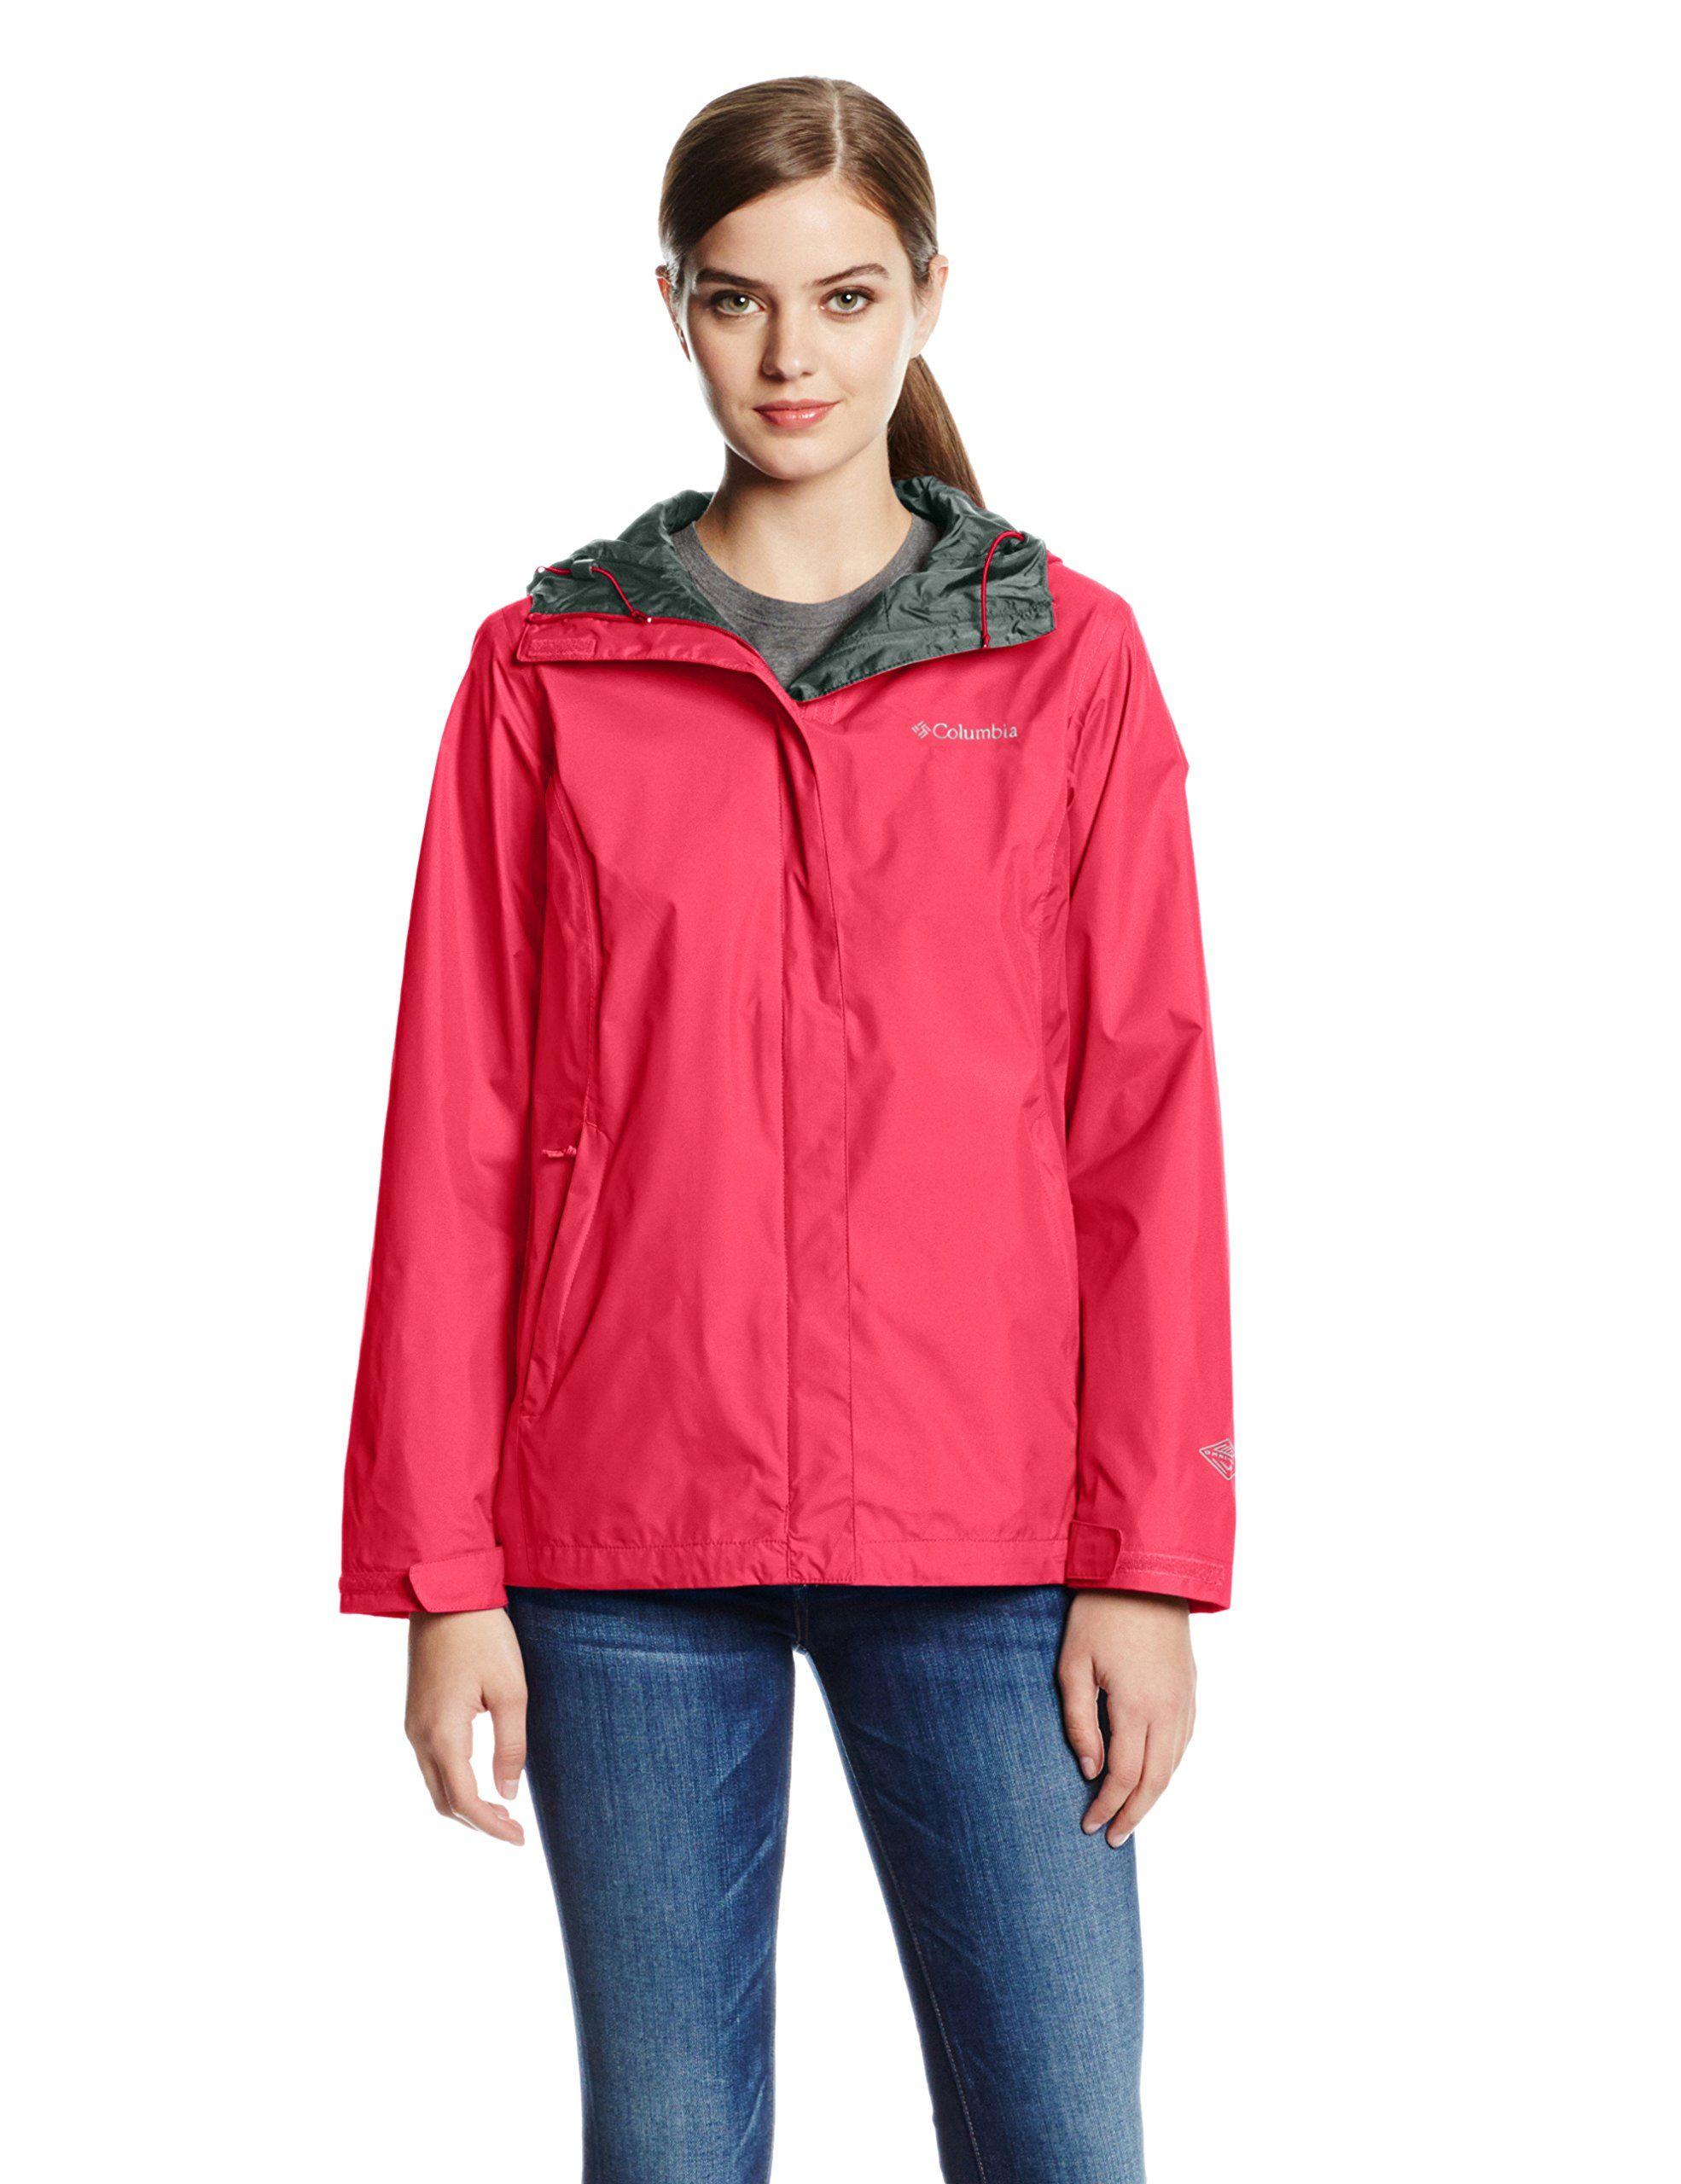 bfd6e5718e1 Columbia Women s Arcadia II Jacket